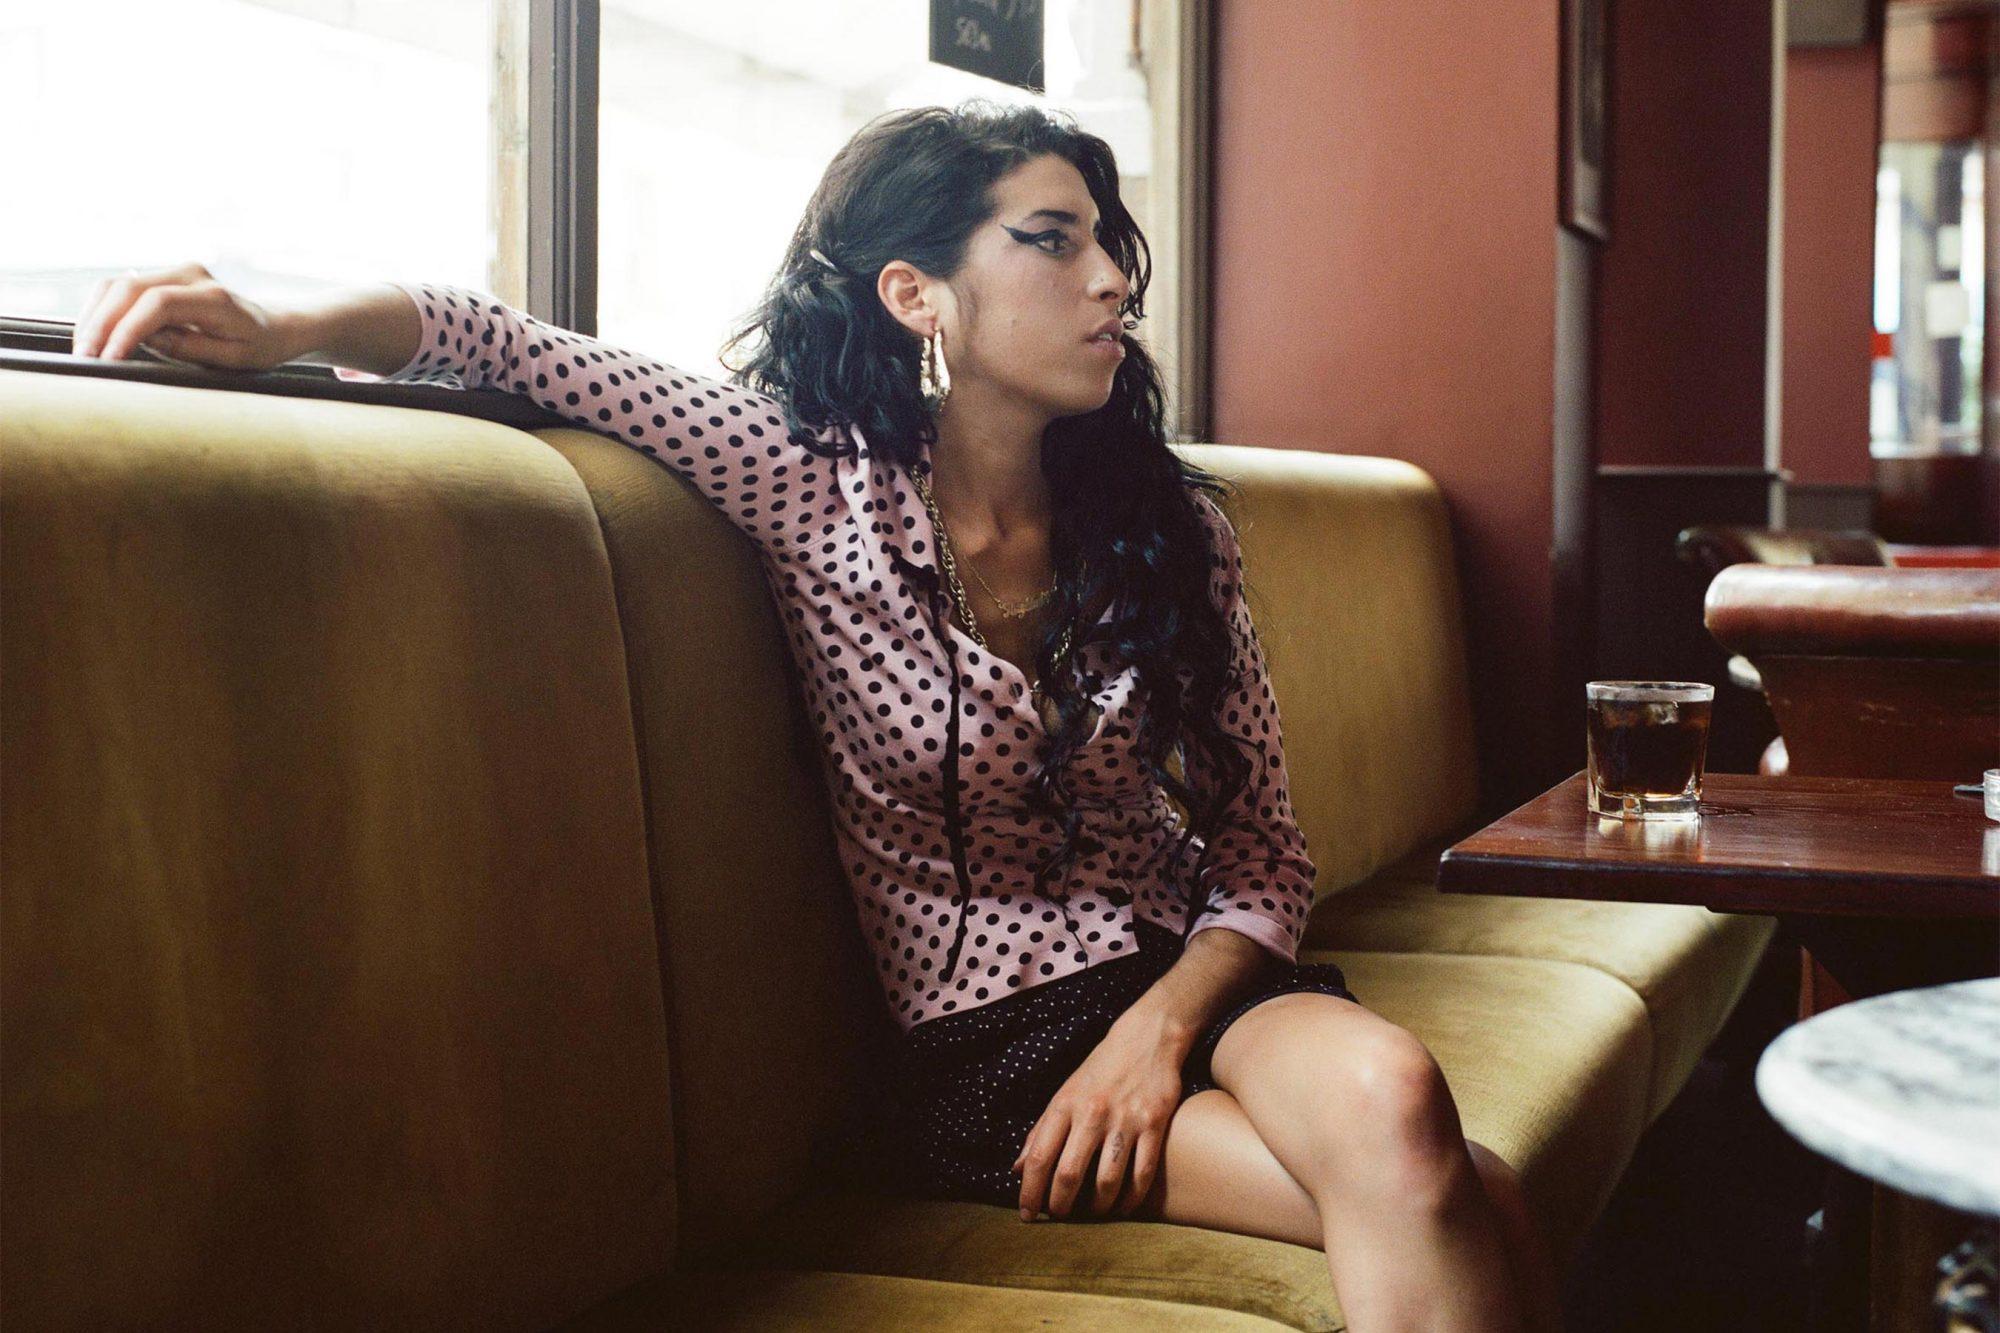 Amy Winehouse publicity photo CR: Mischa Richter